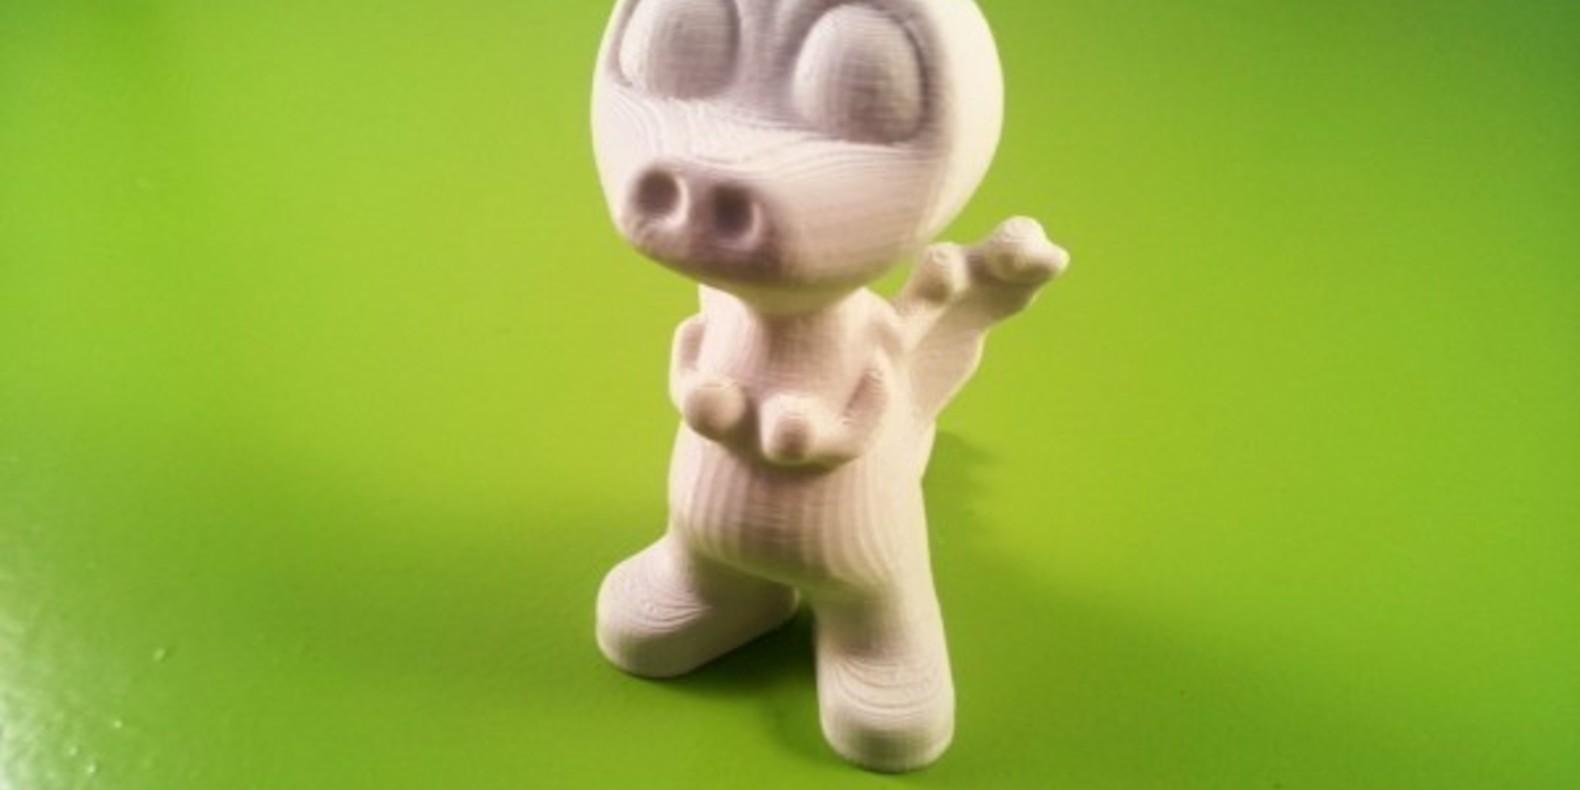 http://fichier3d.fr/wp-content/uploads/2014/01/dolf-veenvliet-macouno-cults3D-cults-designer-artist-3D-printing-monkey-skull-dragon-minotaur-dorus-manus-22.jpg